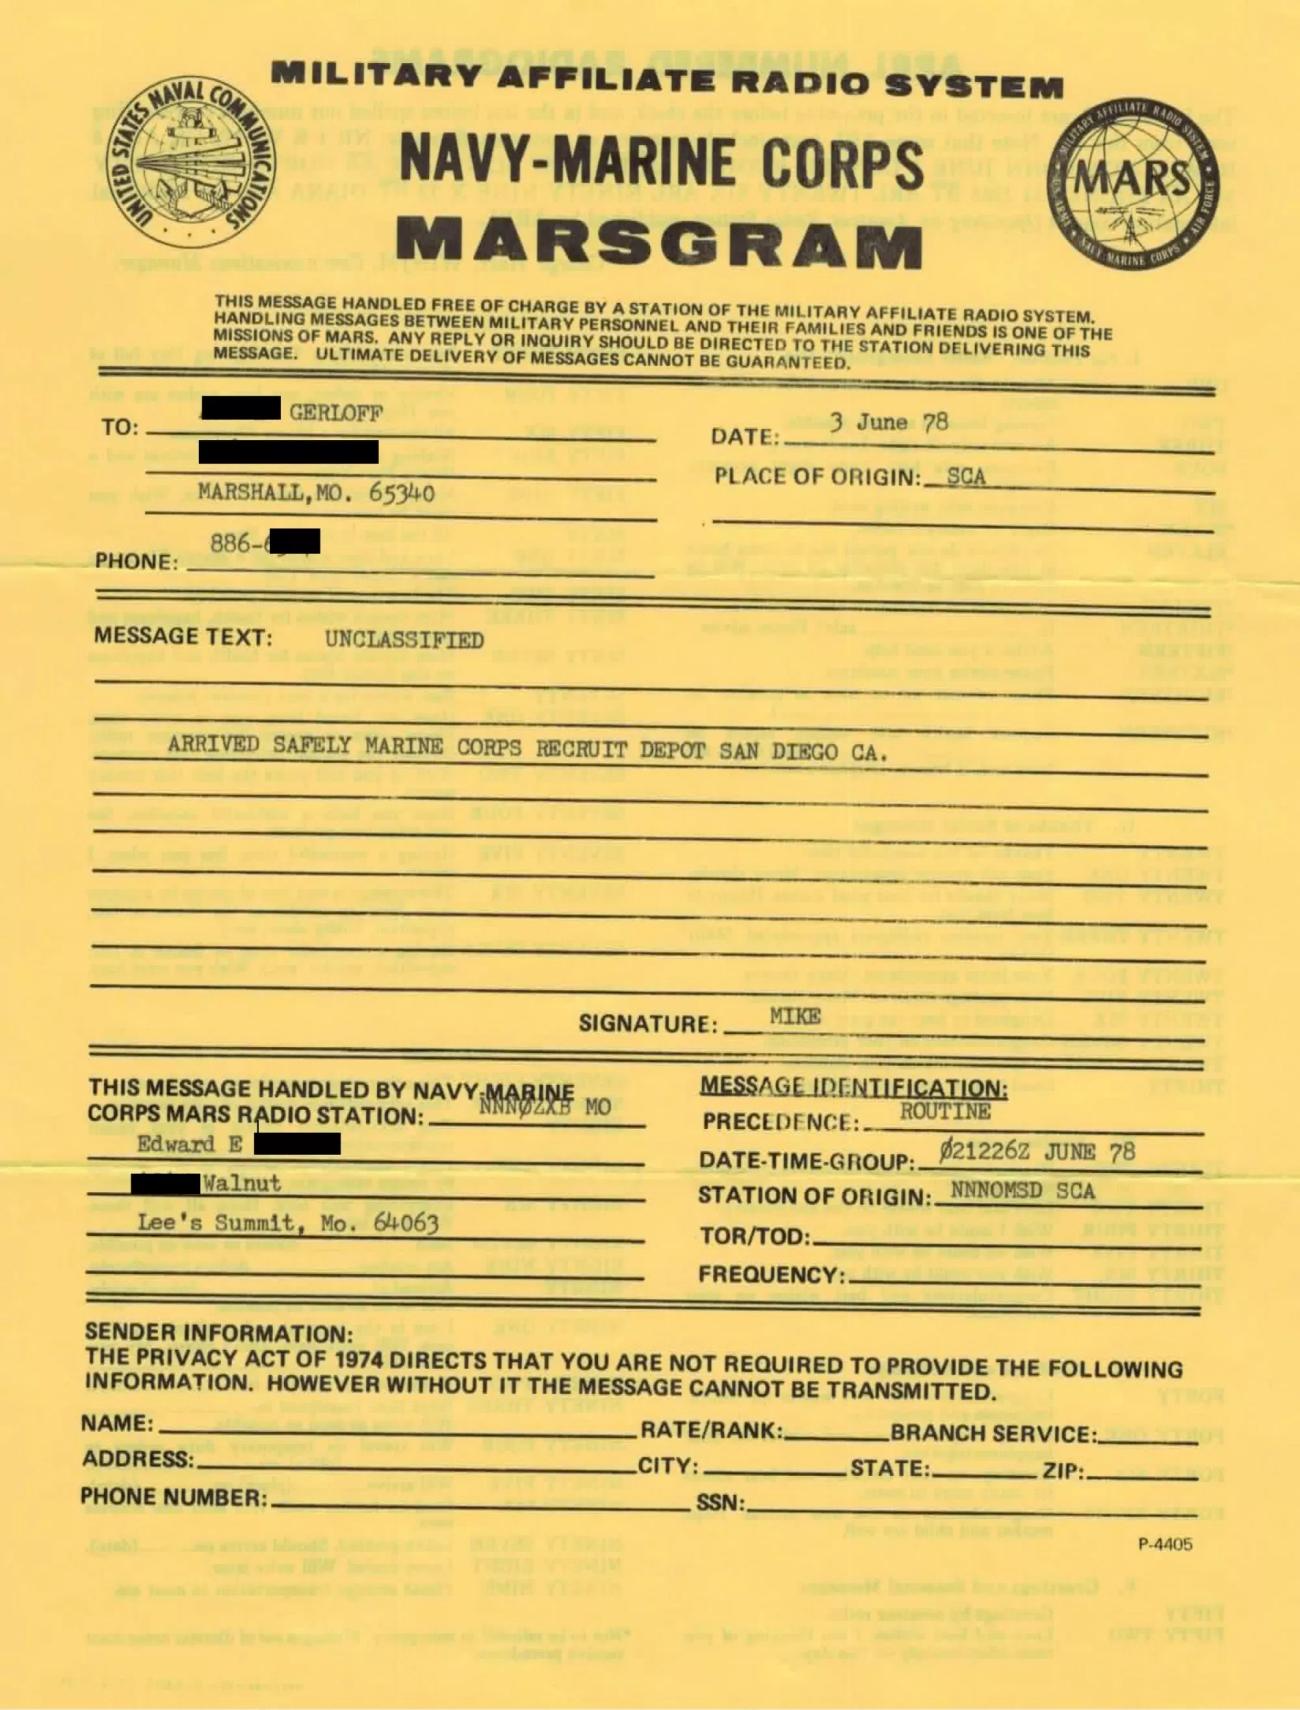 8-MARSGRAM-blacked-out-names